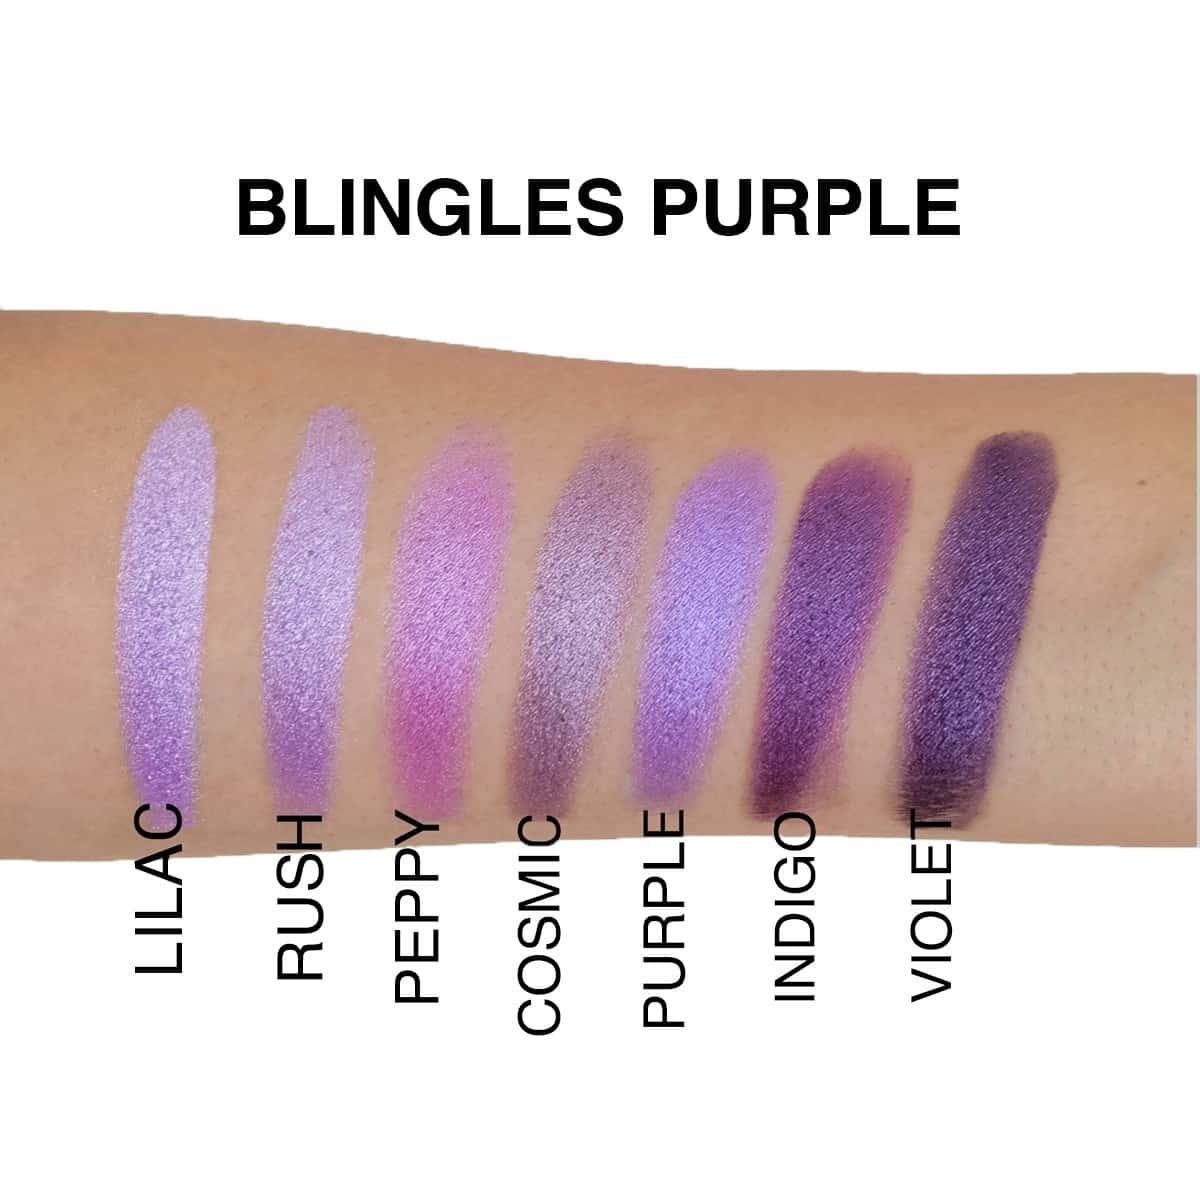 Blingles-Purple